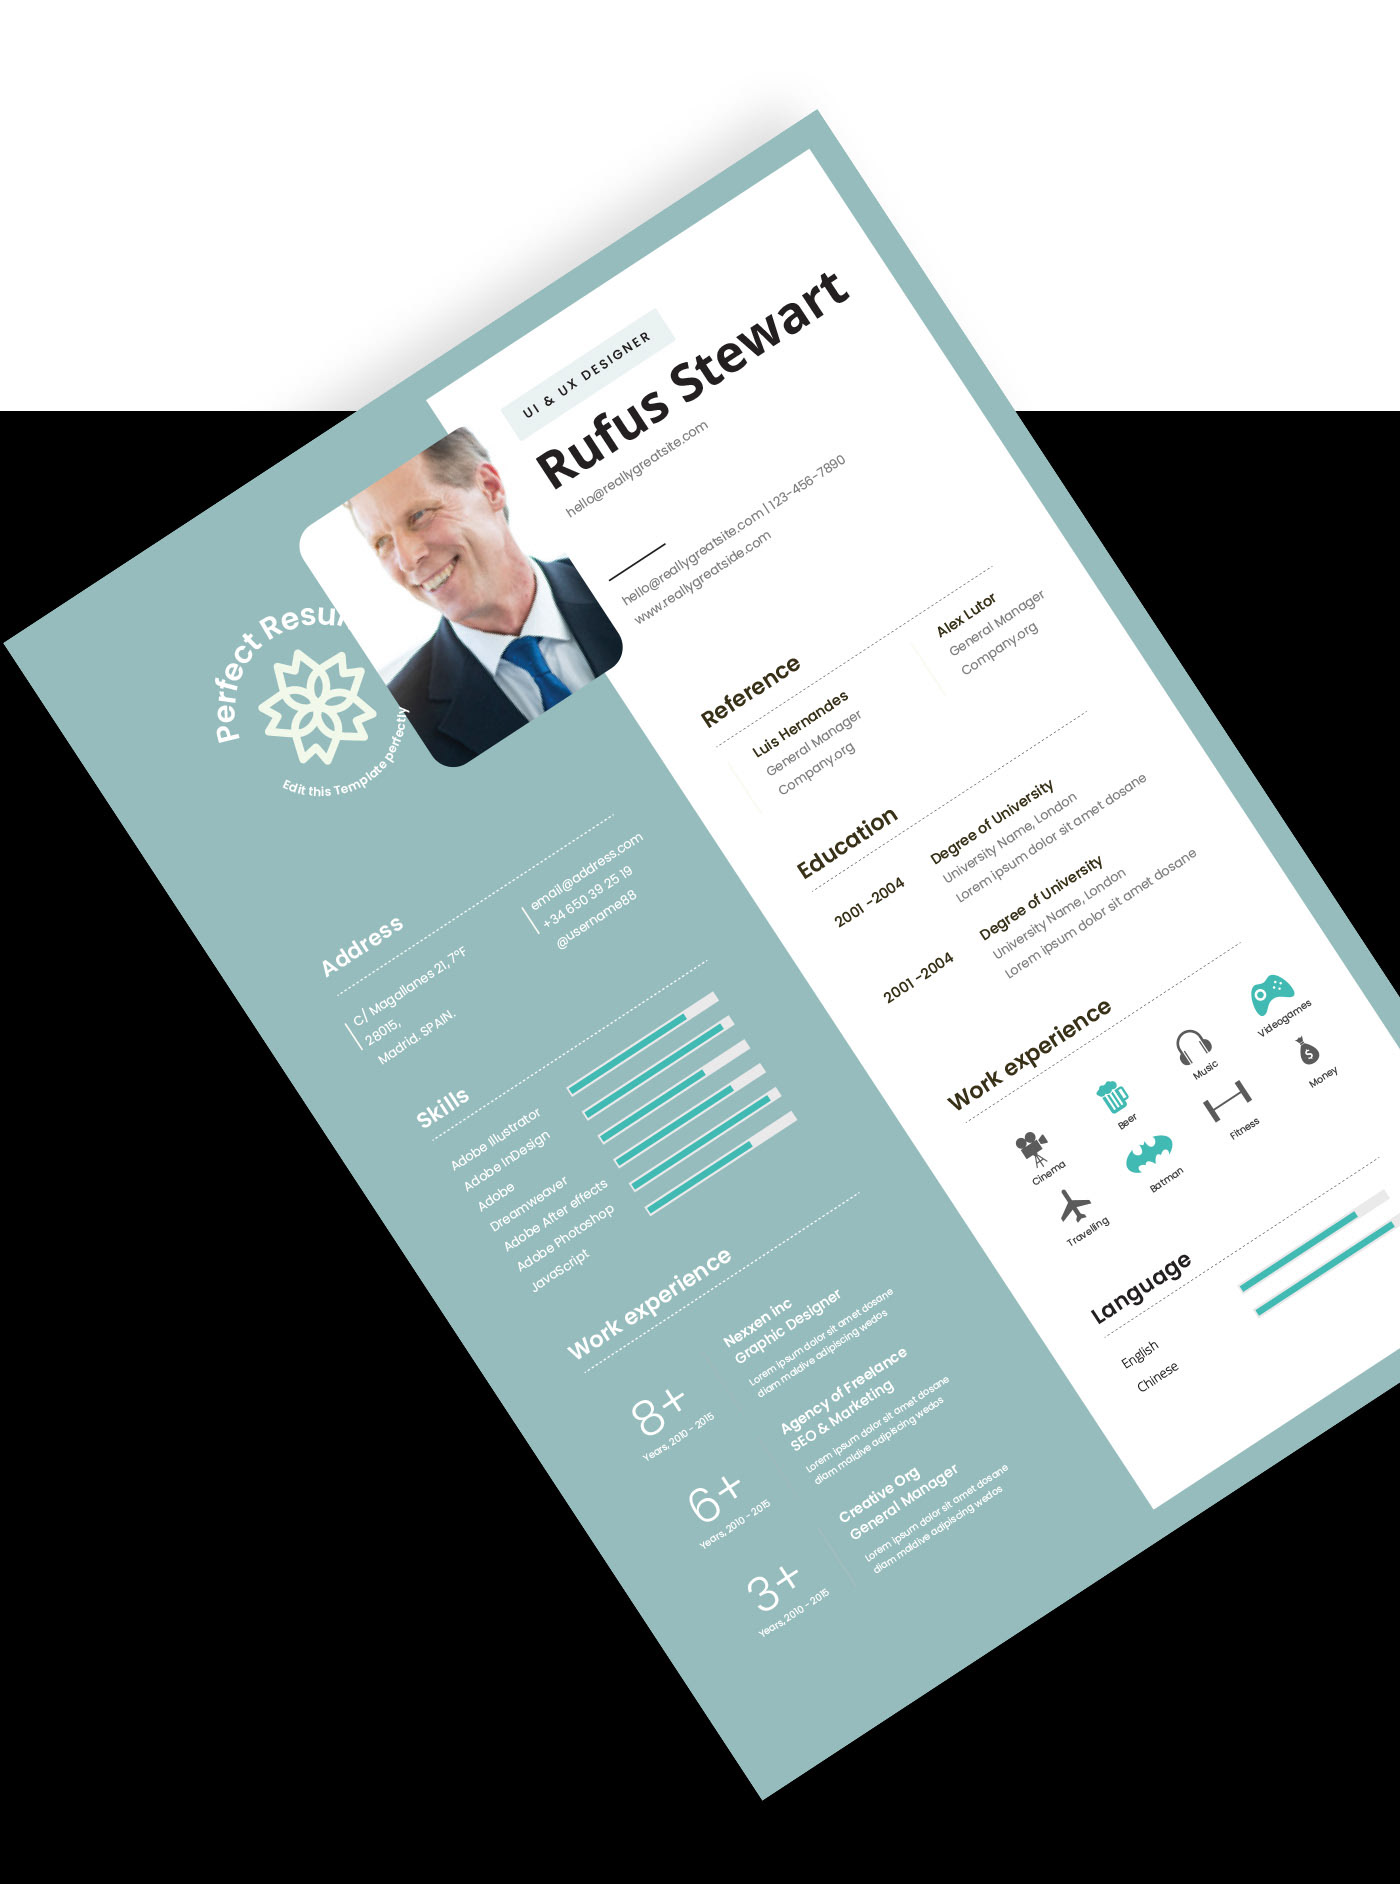 CV / RESUME infographic resume minimalist resume modern cv Modern Resume professional cv